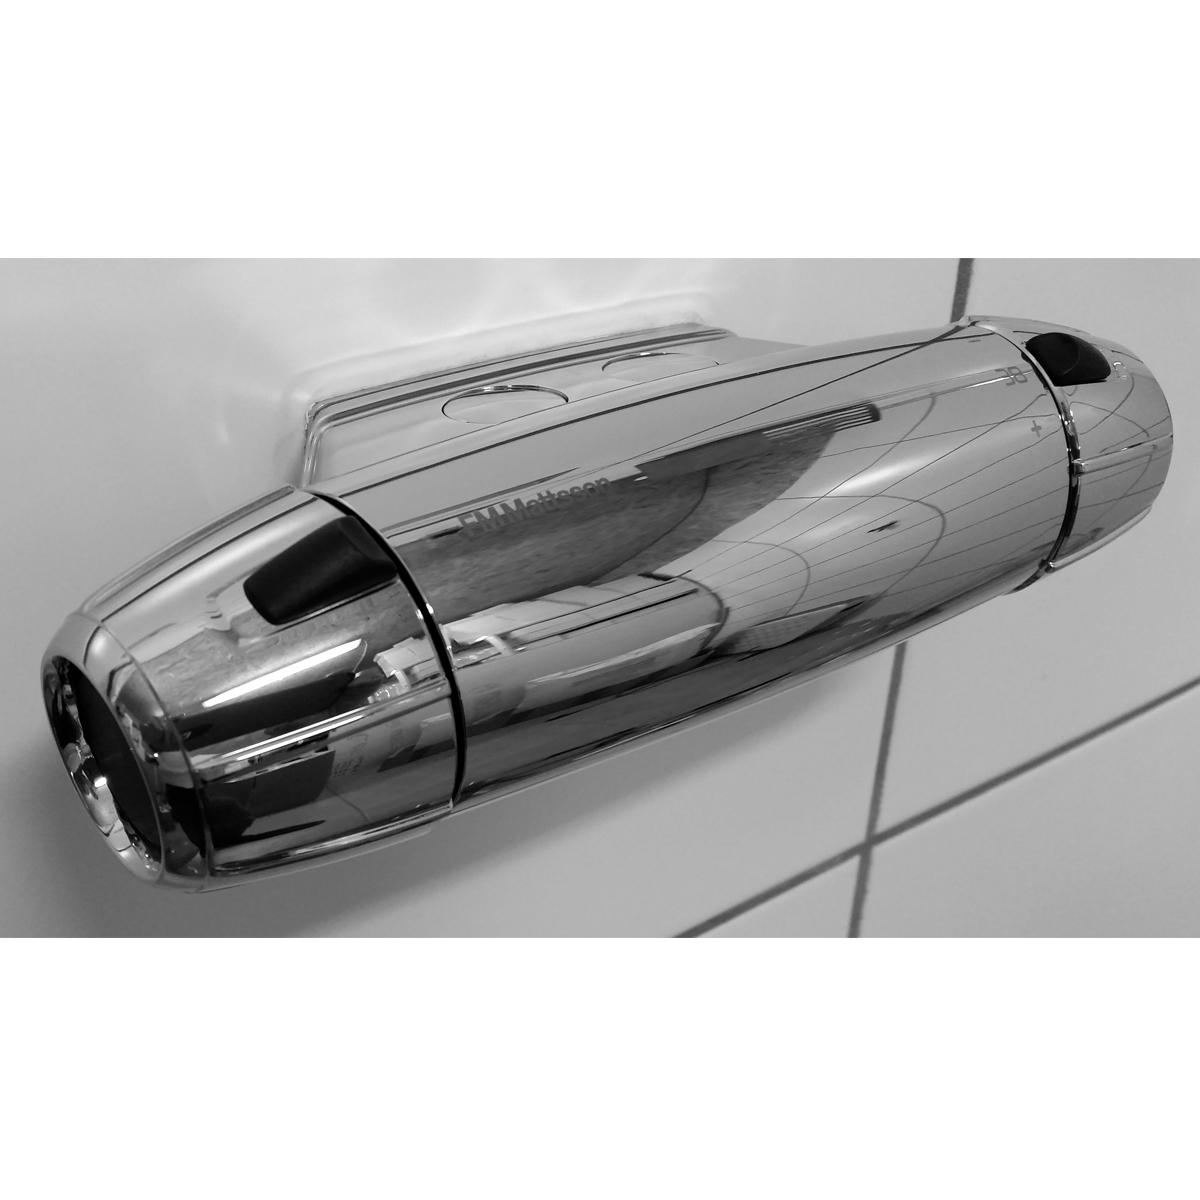 Montage/limbricka till blandare fmm 9000e 40cc – design4bath